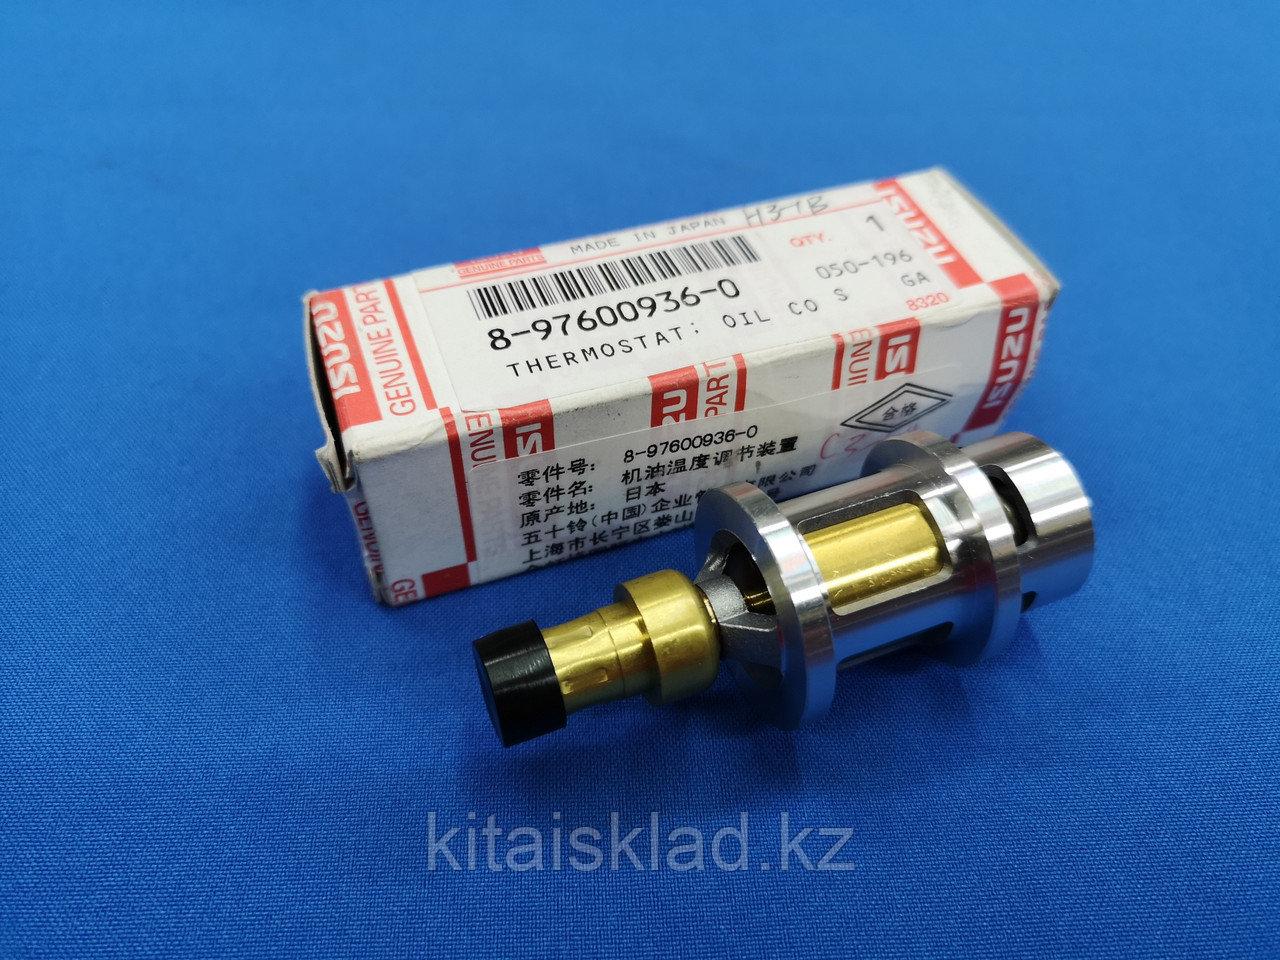 Масляный термостат 8-97600936-0 ISUZU 4HK1, 6HK1